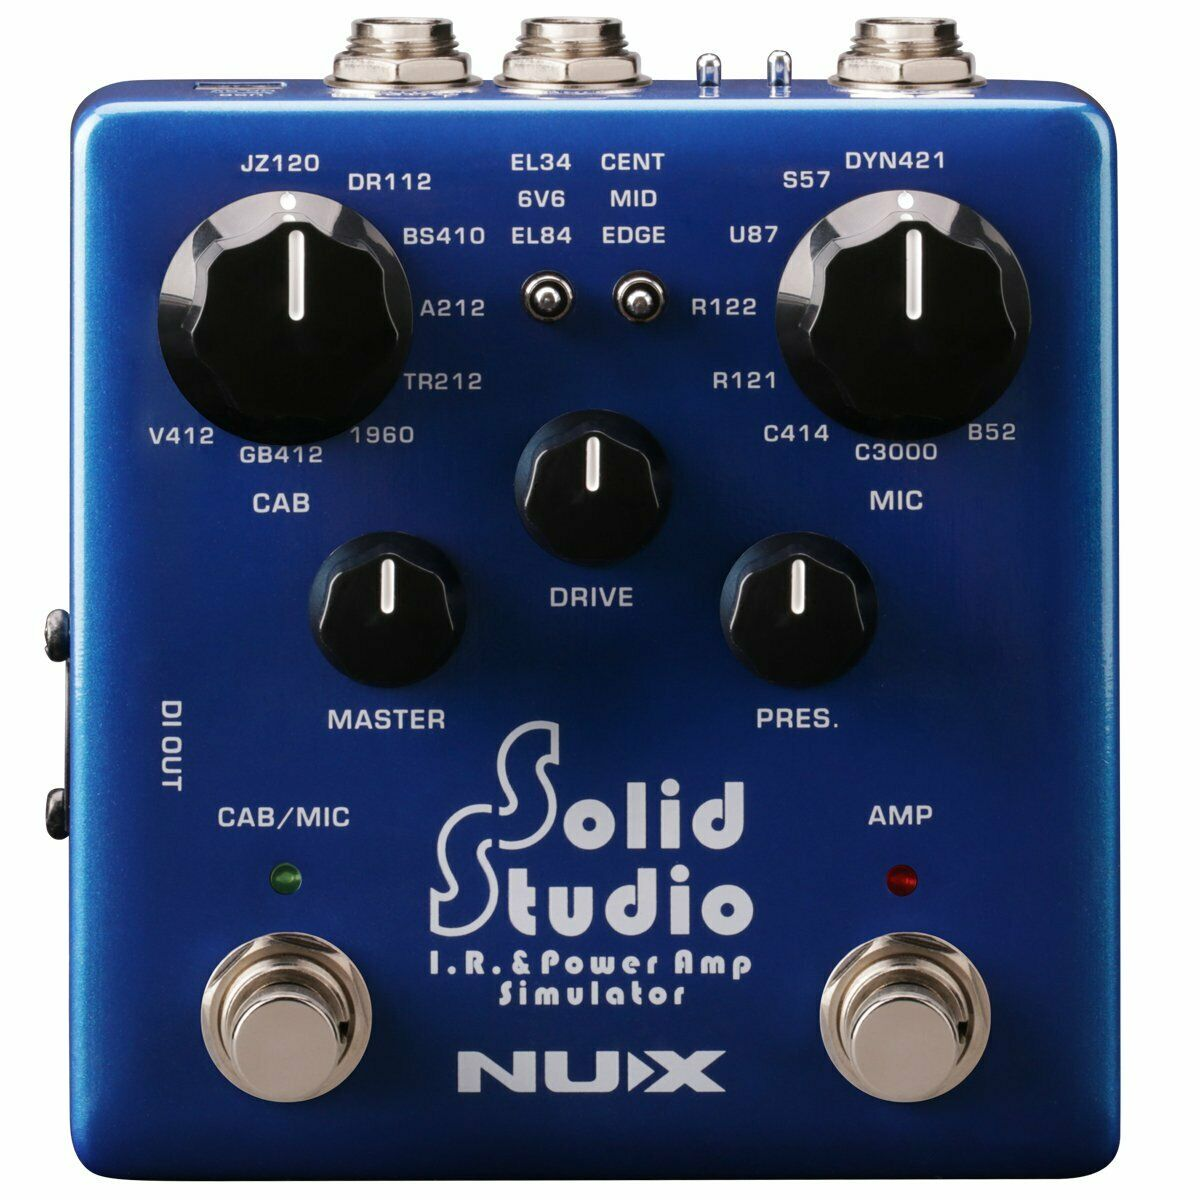 NEW NUX NSS-5 Solid Studio IR & Power Amp Simulator